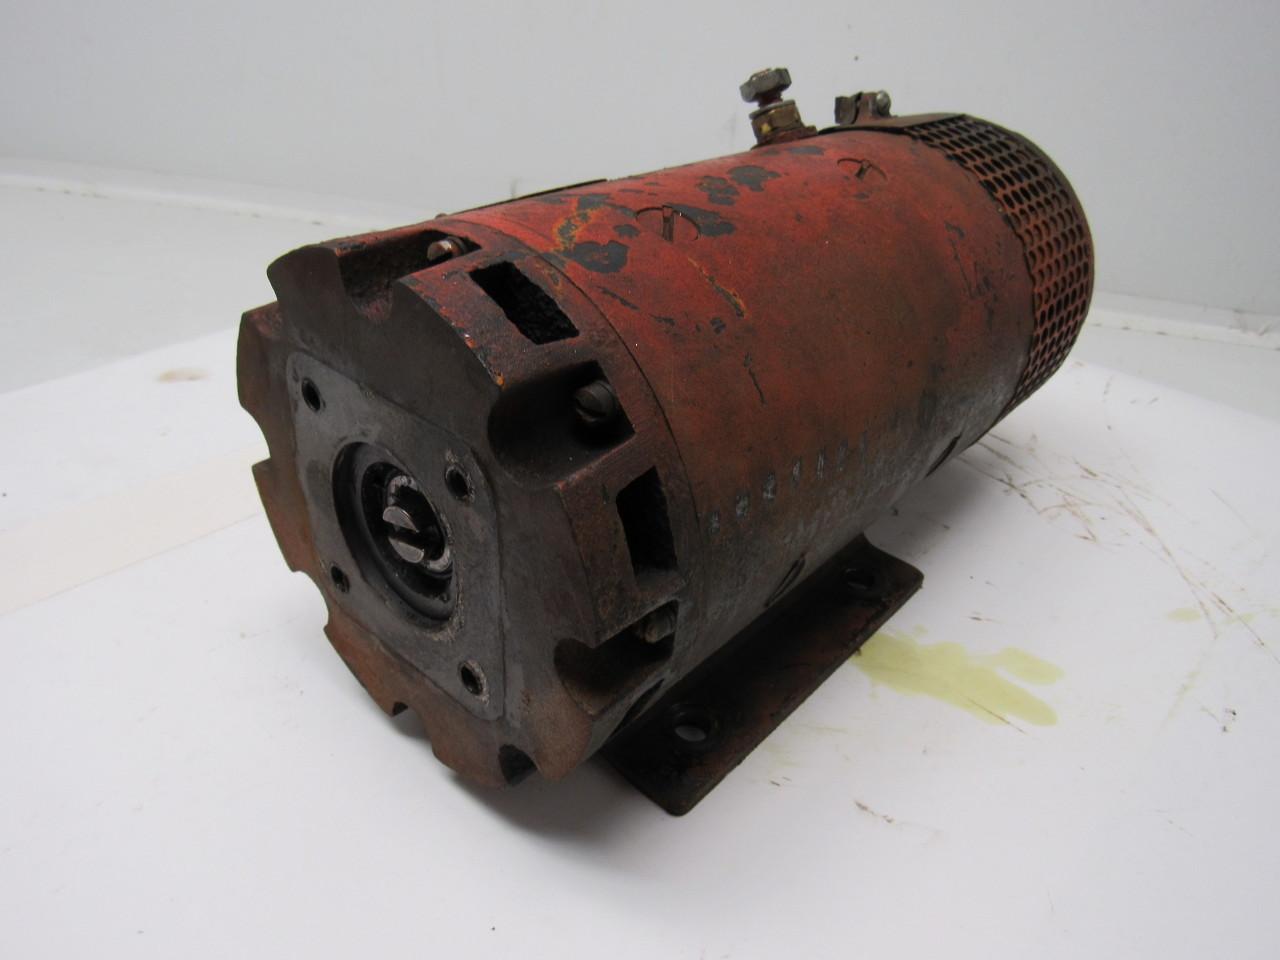 Prestolite Mbd 4304 24vdc Electric Motor From Raymond